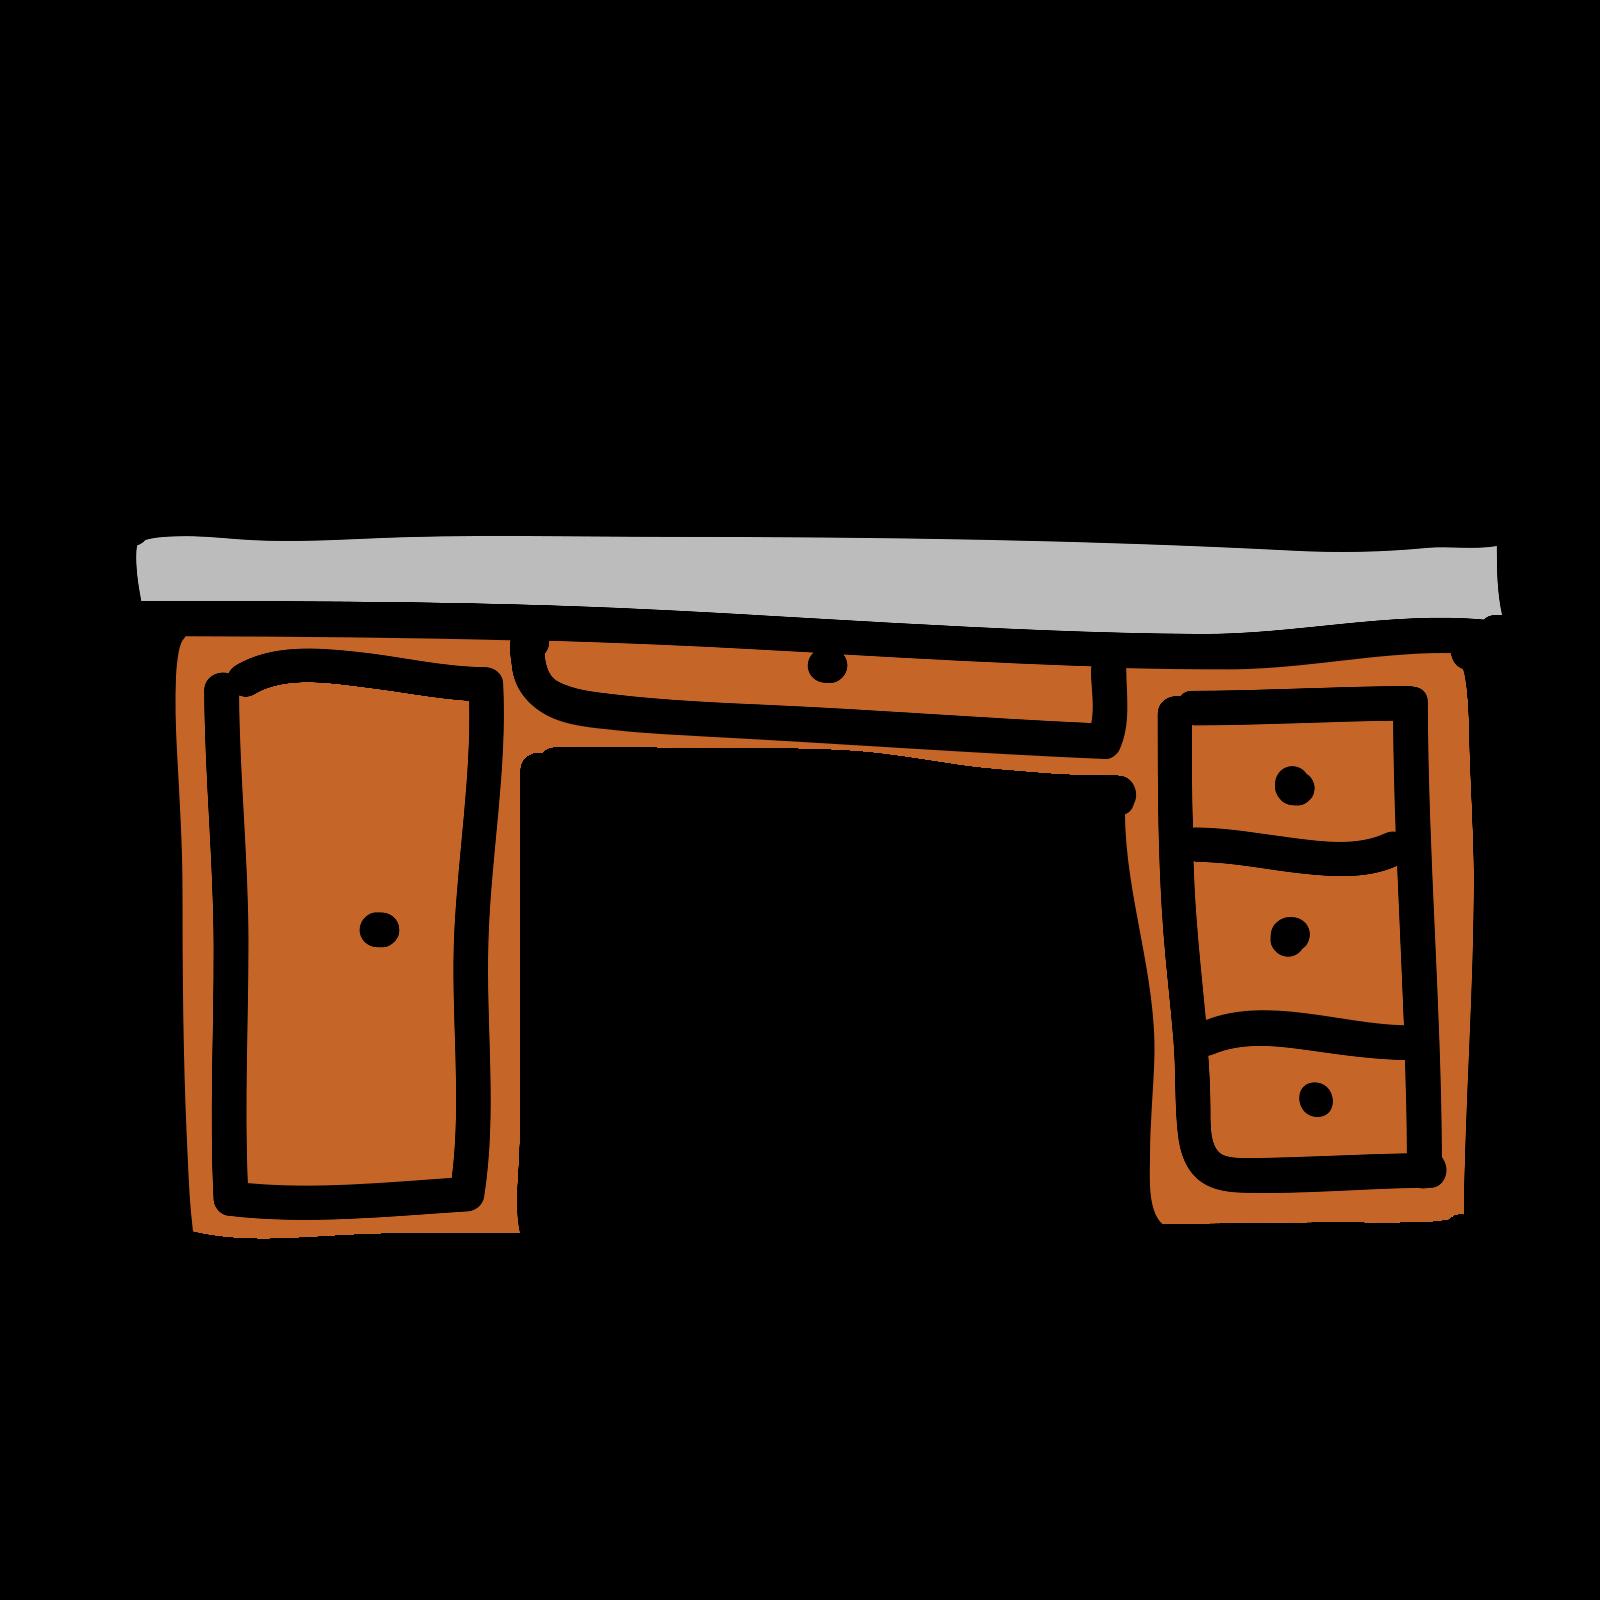 Biurko icon